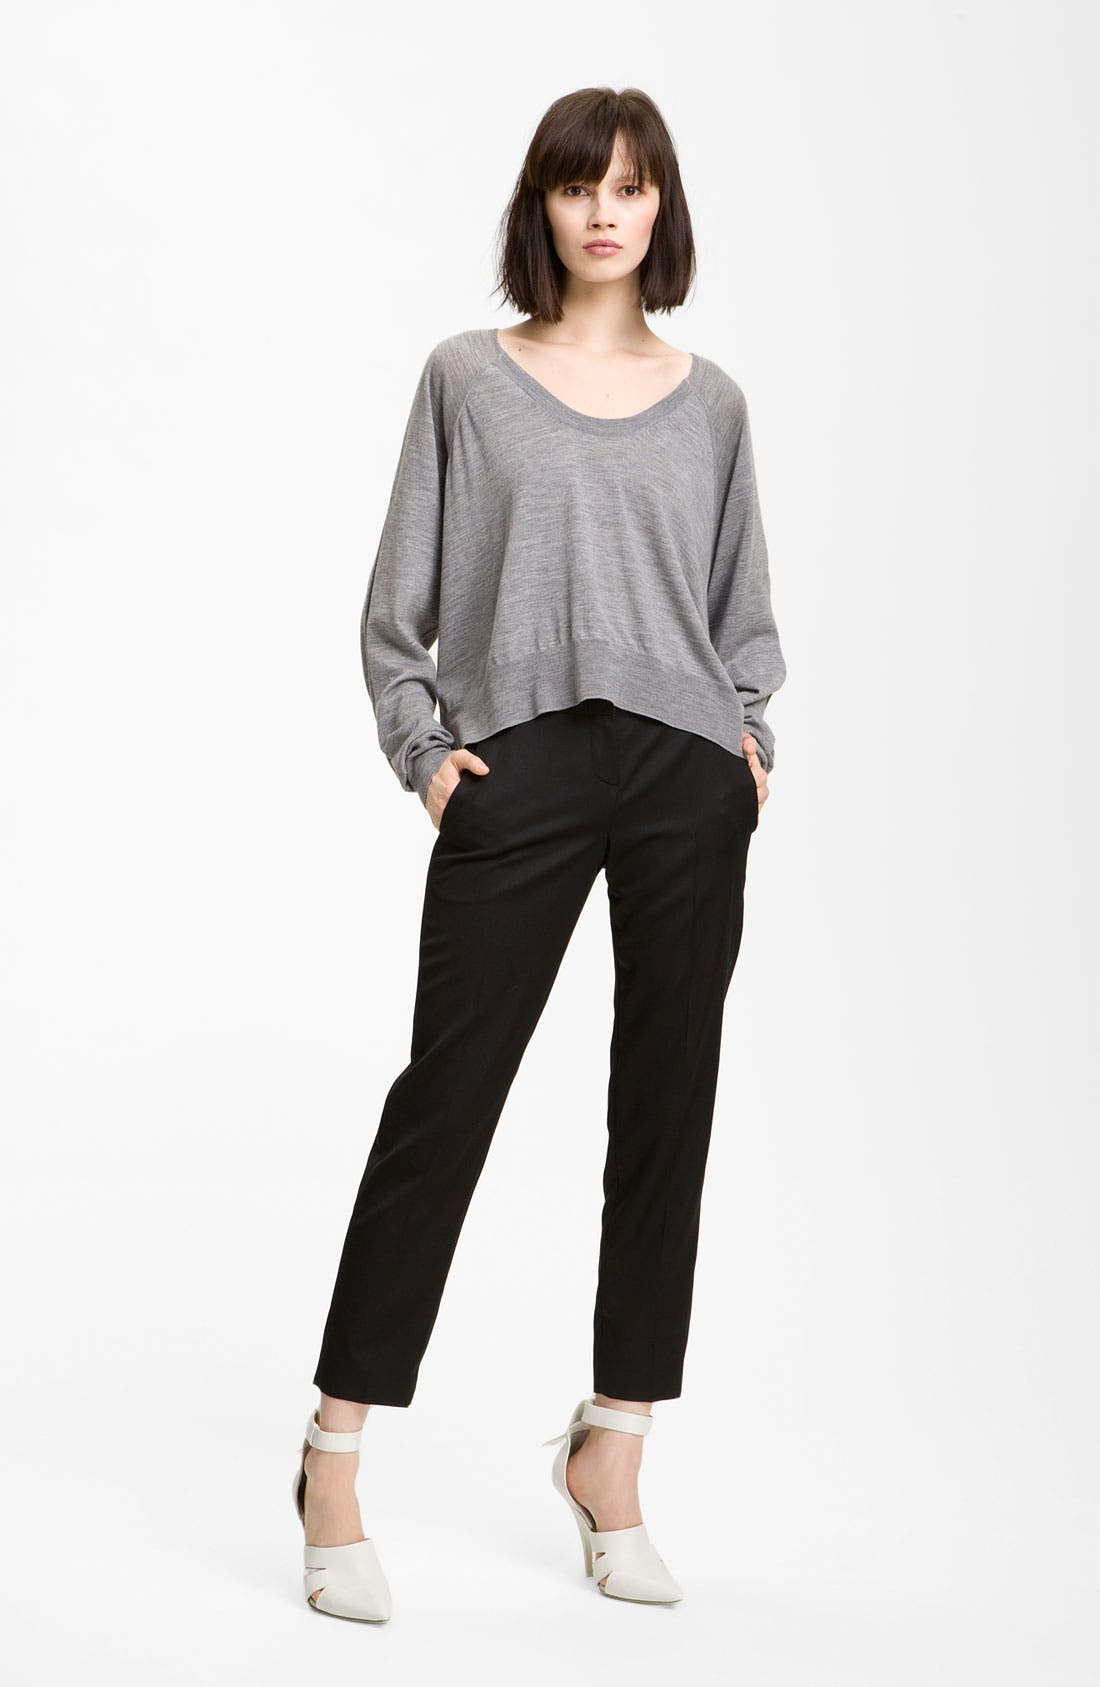 Main Image - Alexander Wang Crop Merino Wool Top